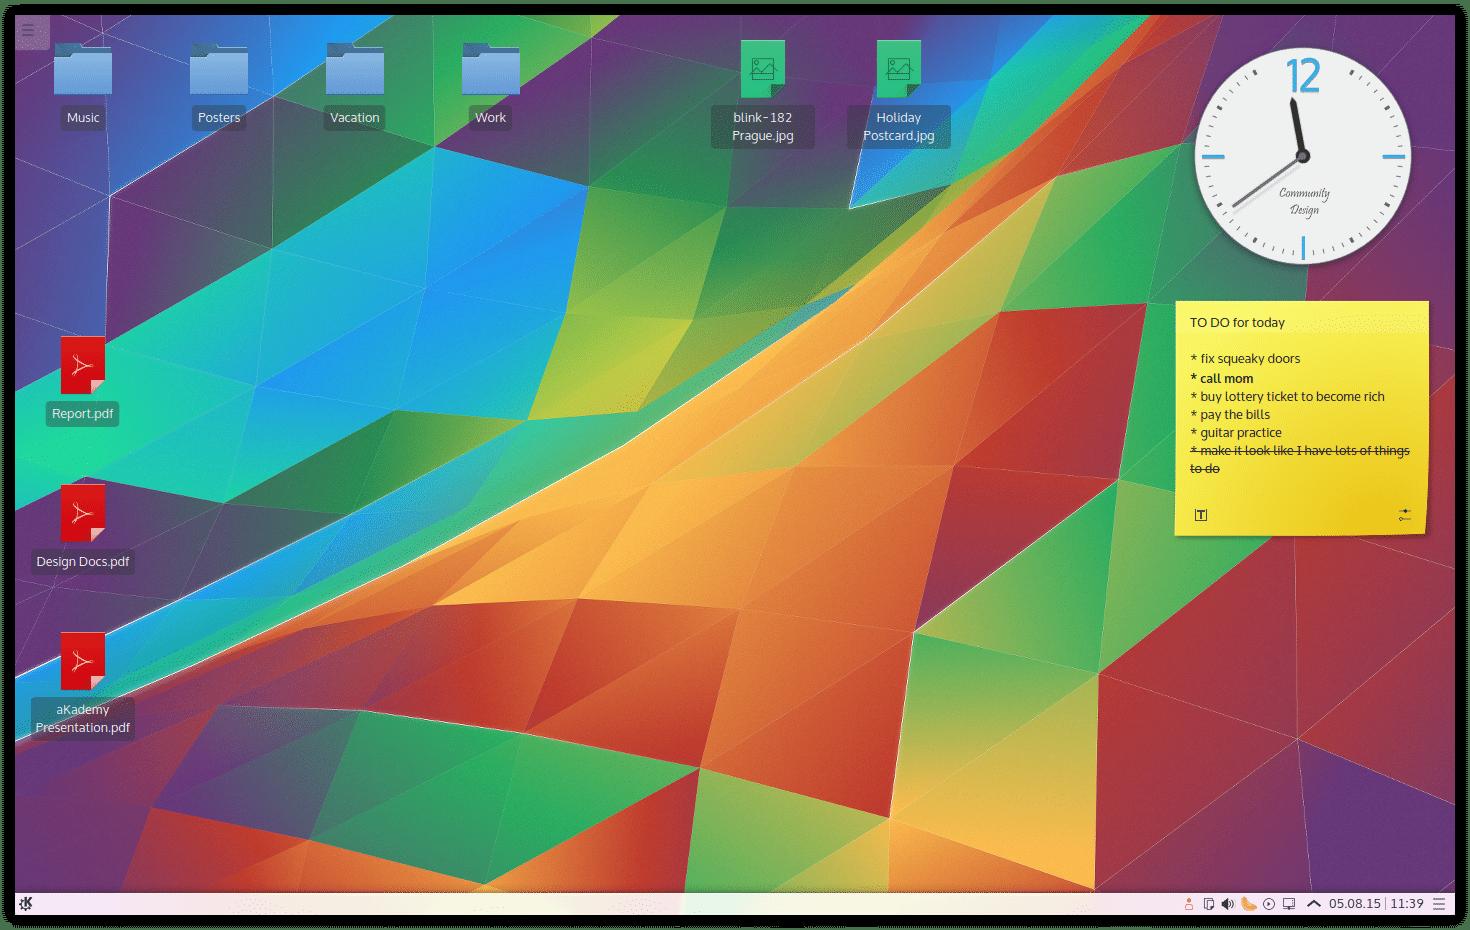 KDE-5.4-fedorafans.com